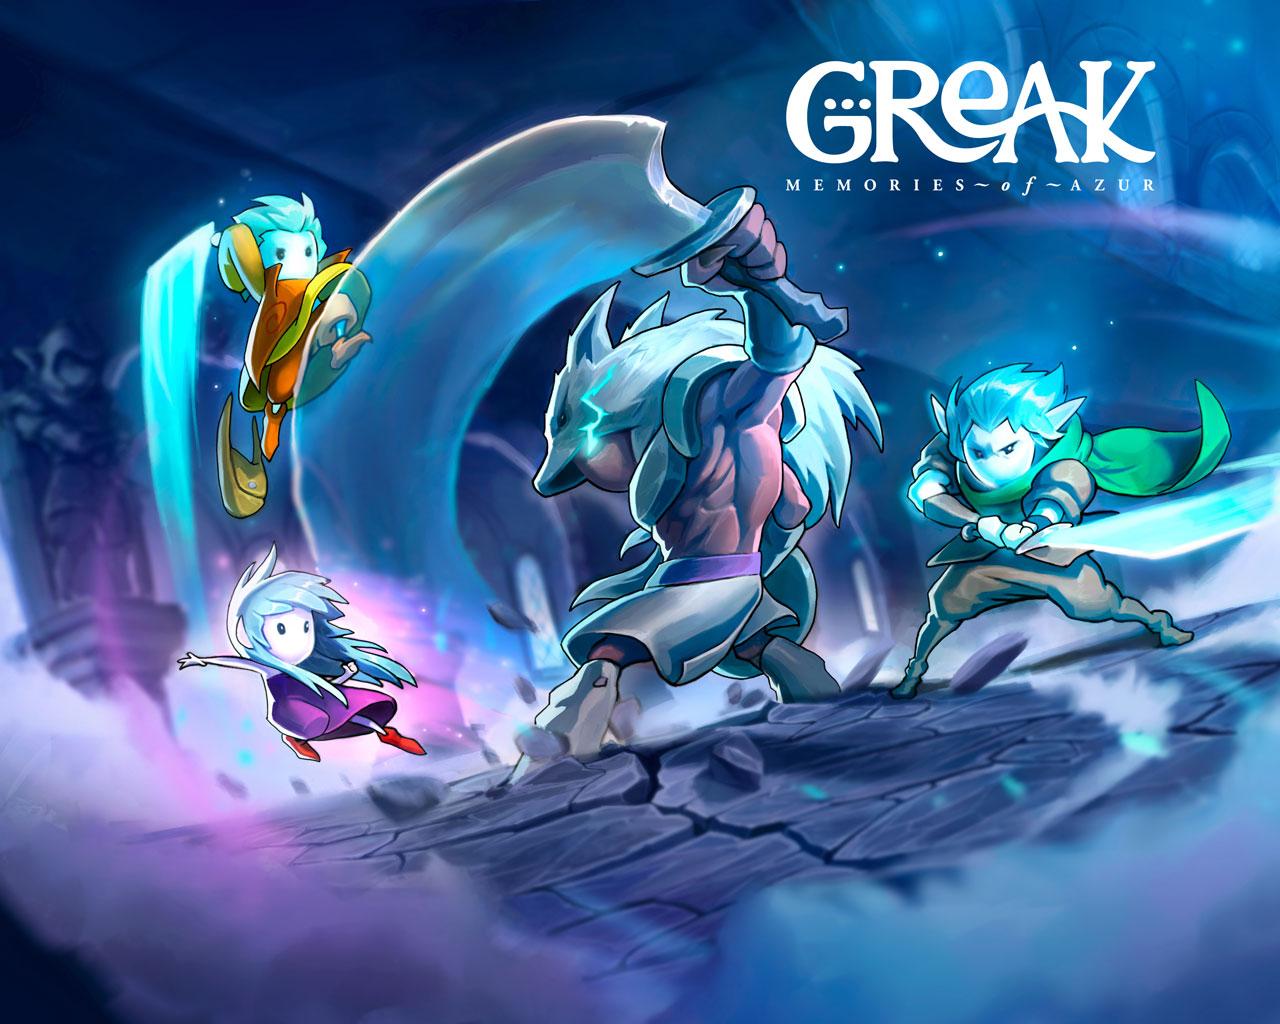 Free Greak: Memories of Azur Wallpaper in 1280x1024